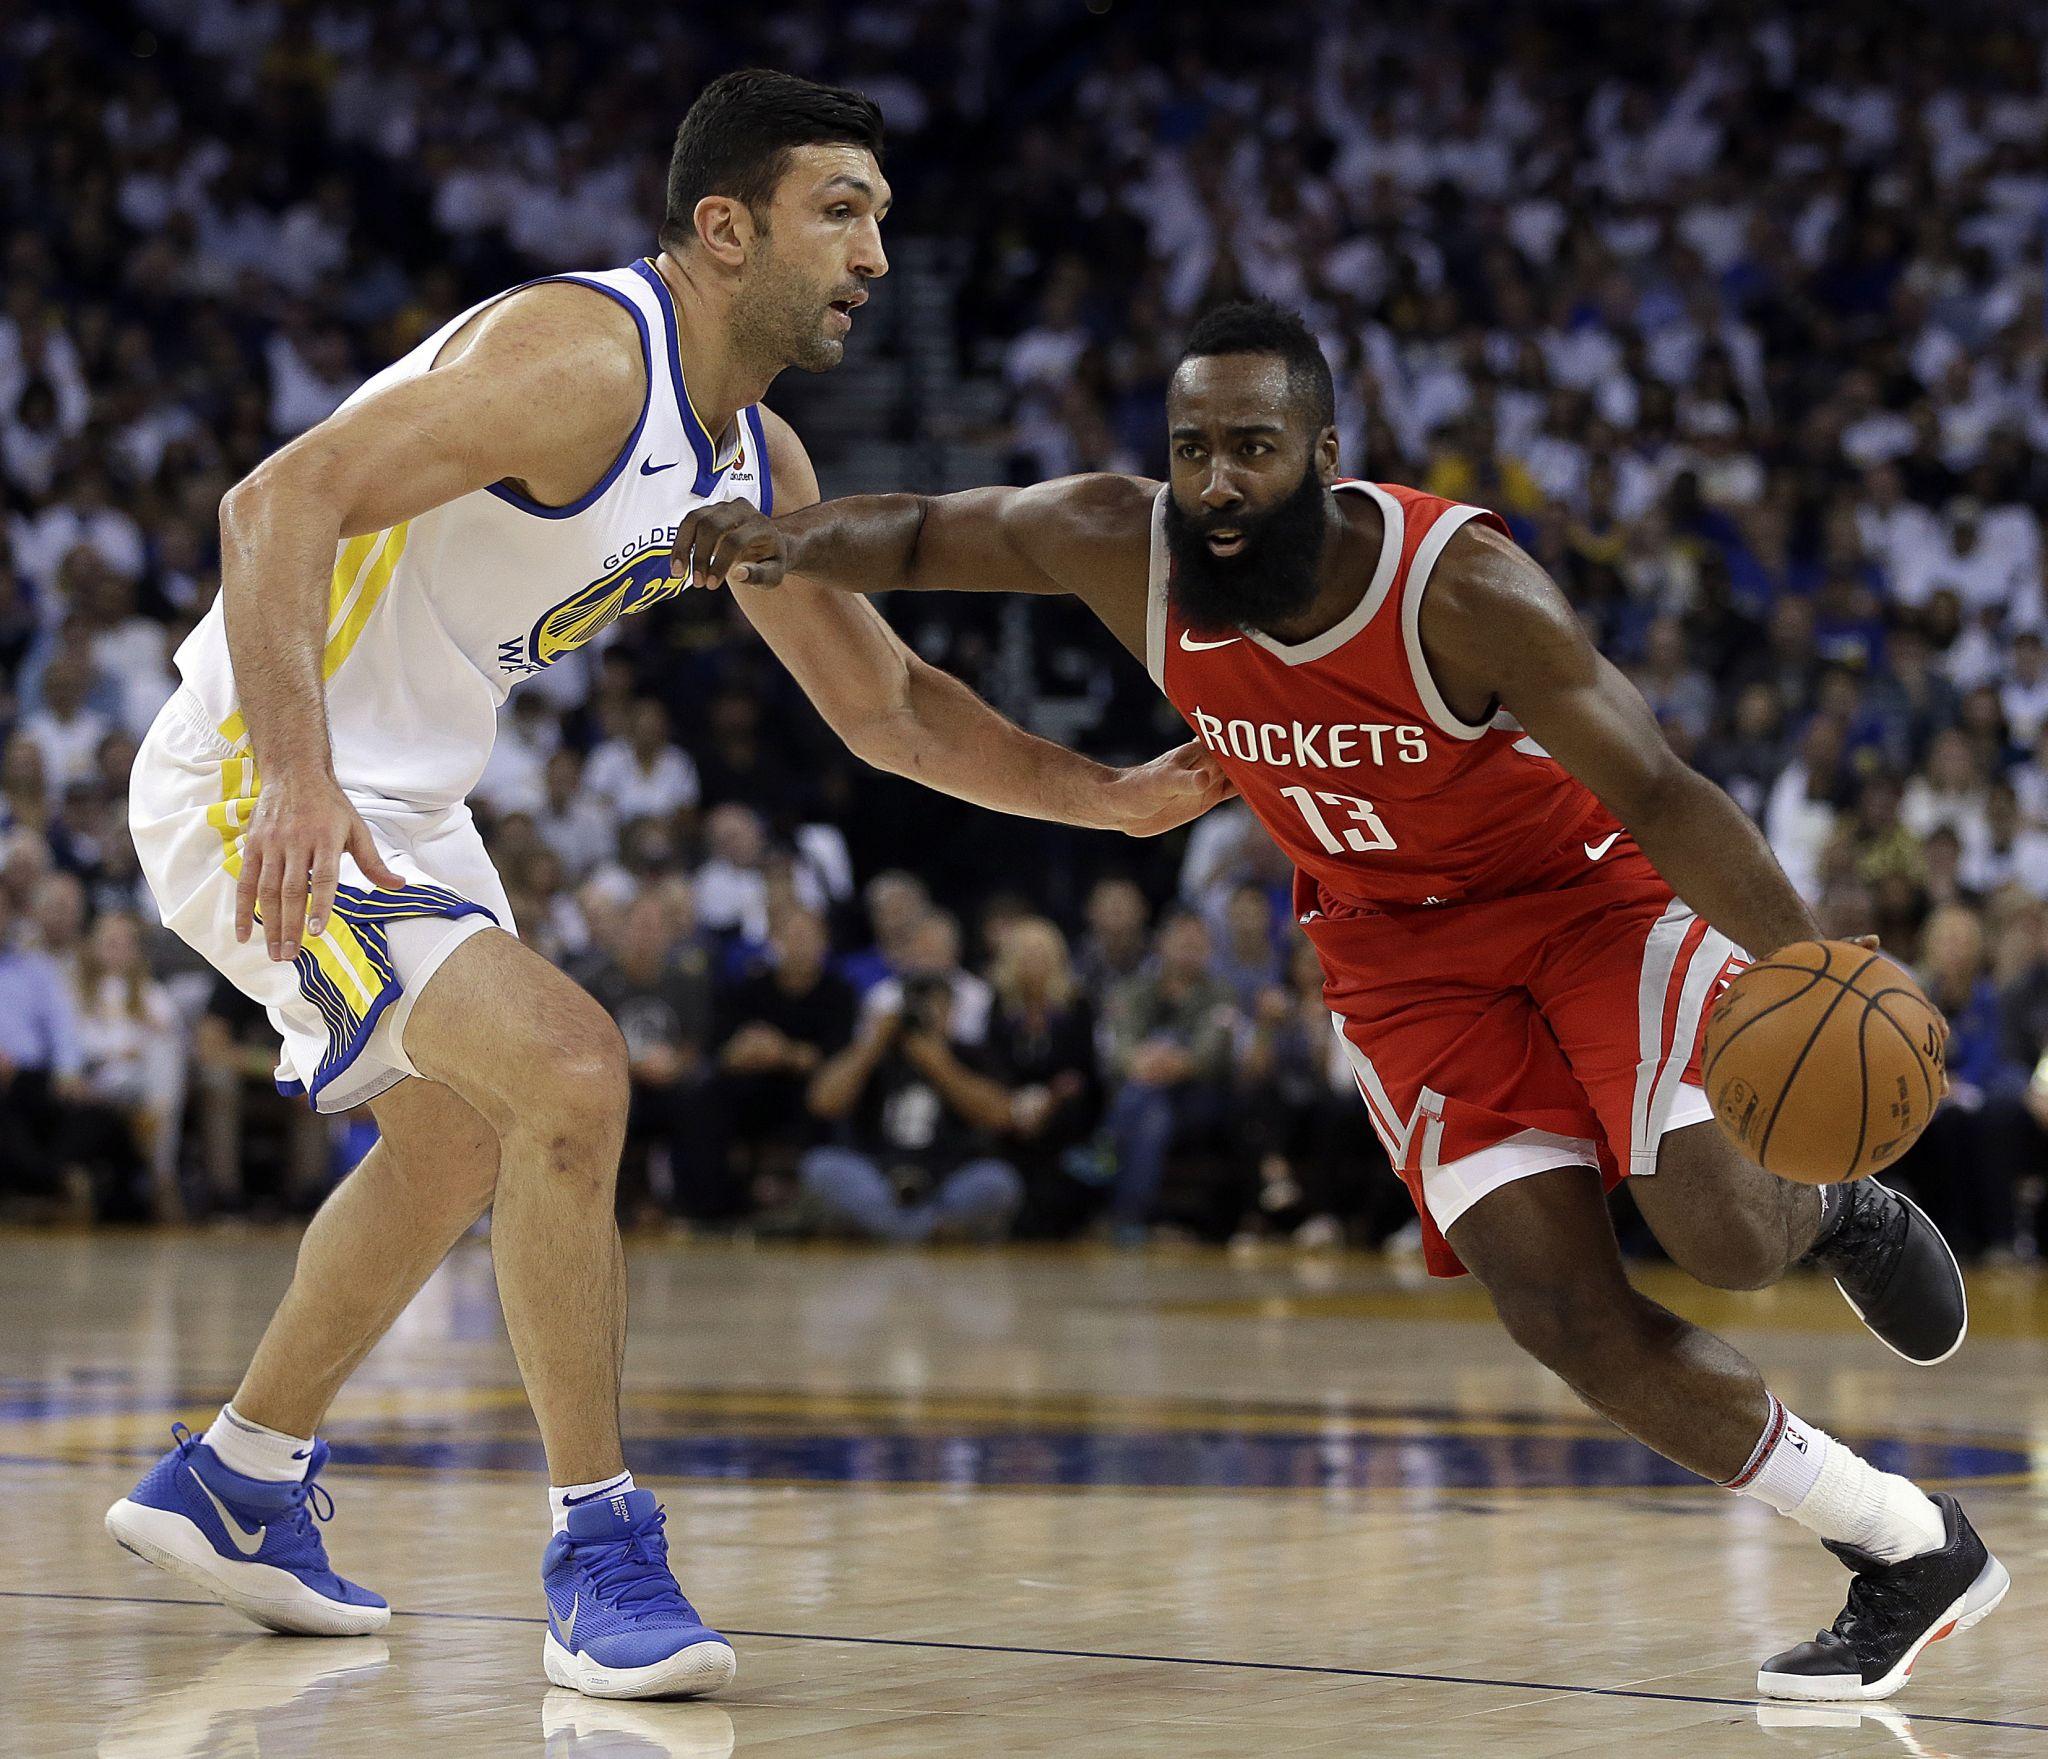 Rockets Vs. Warriors: The Season Series